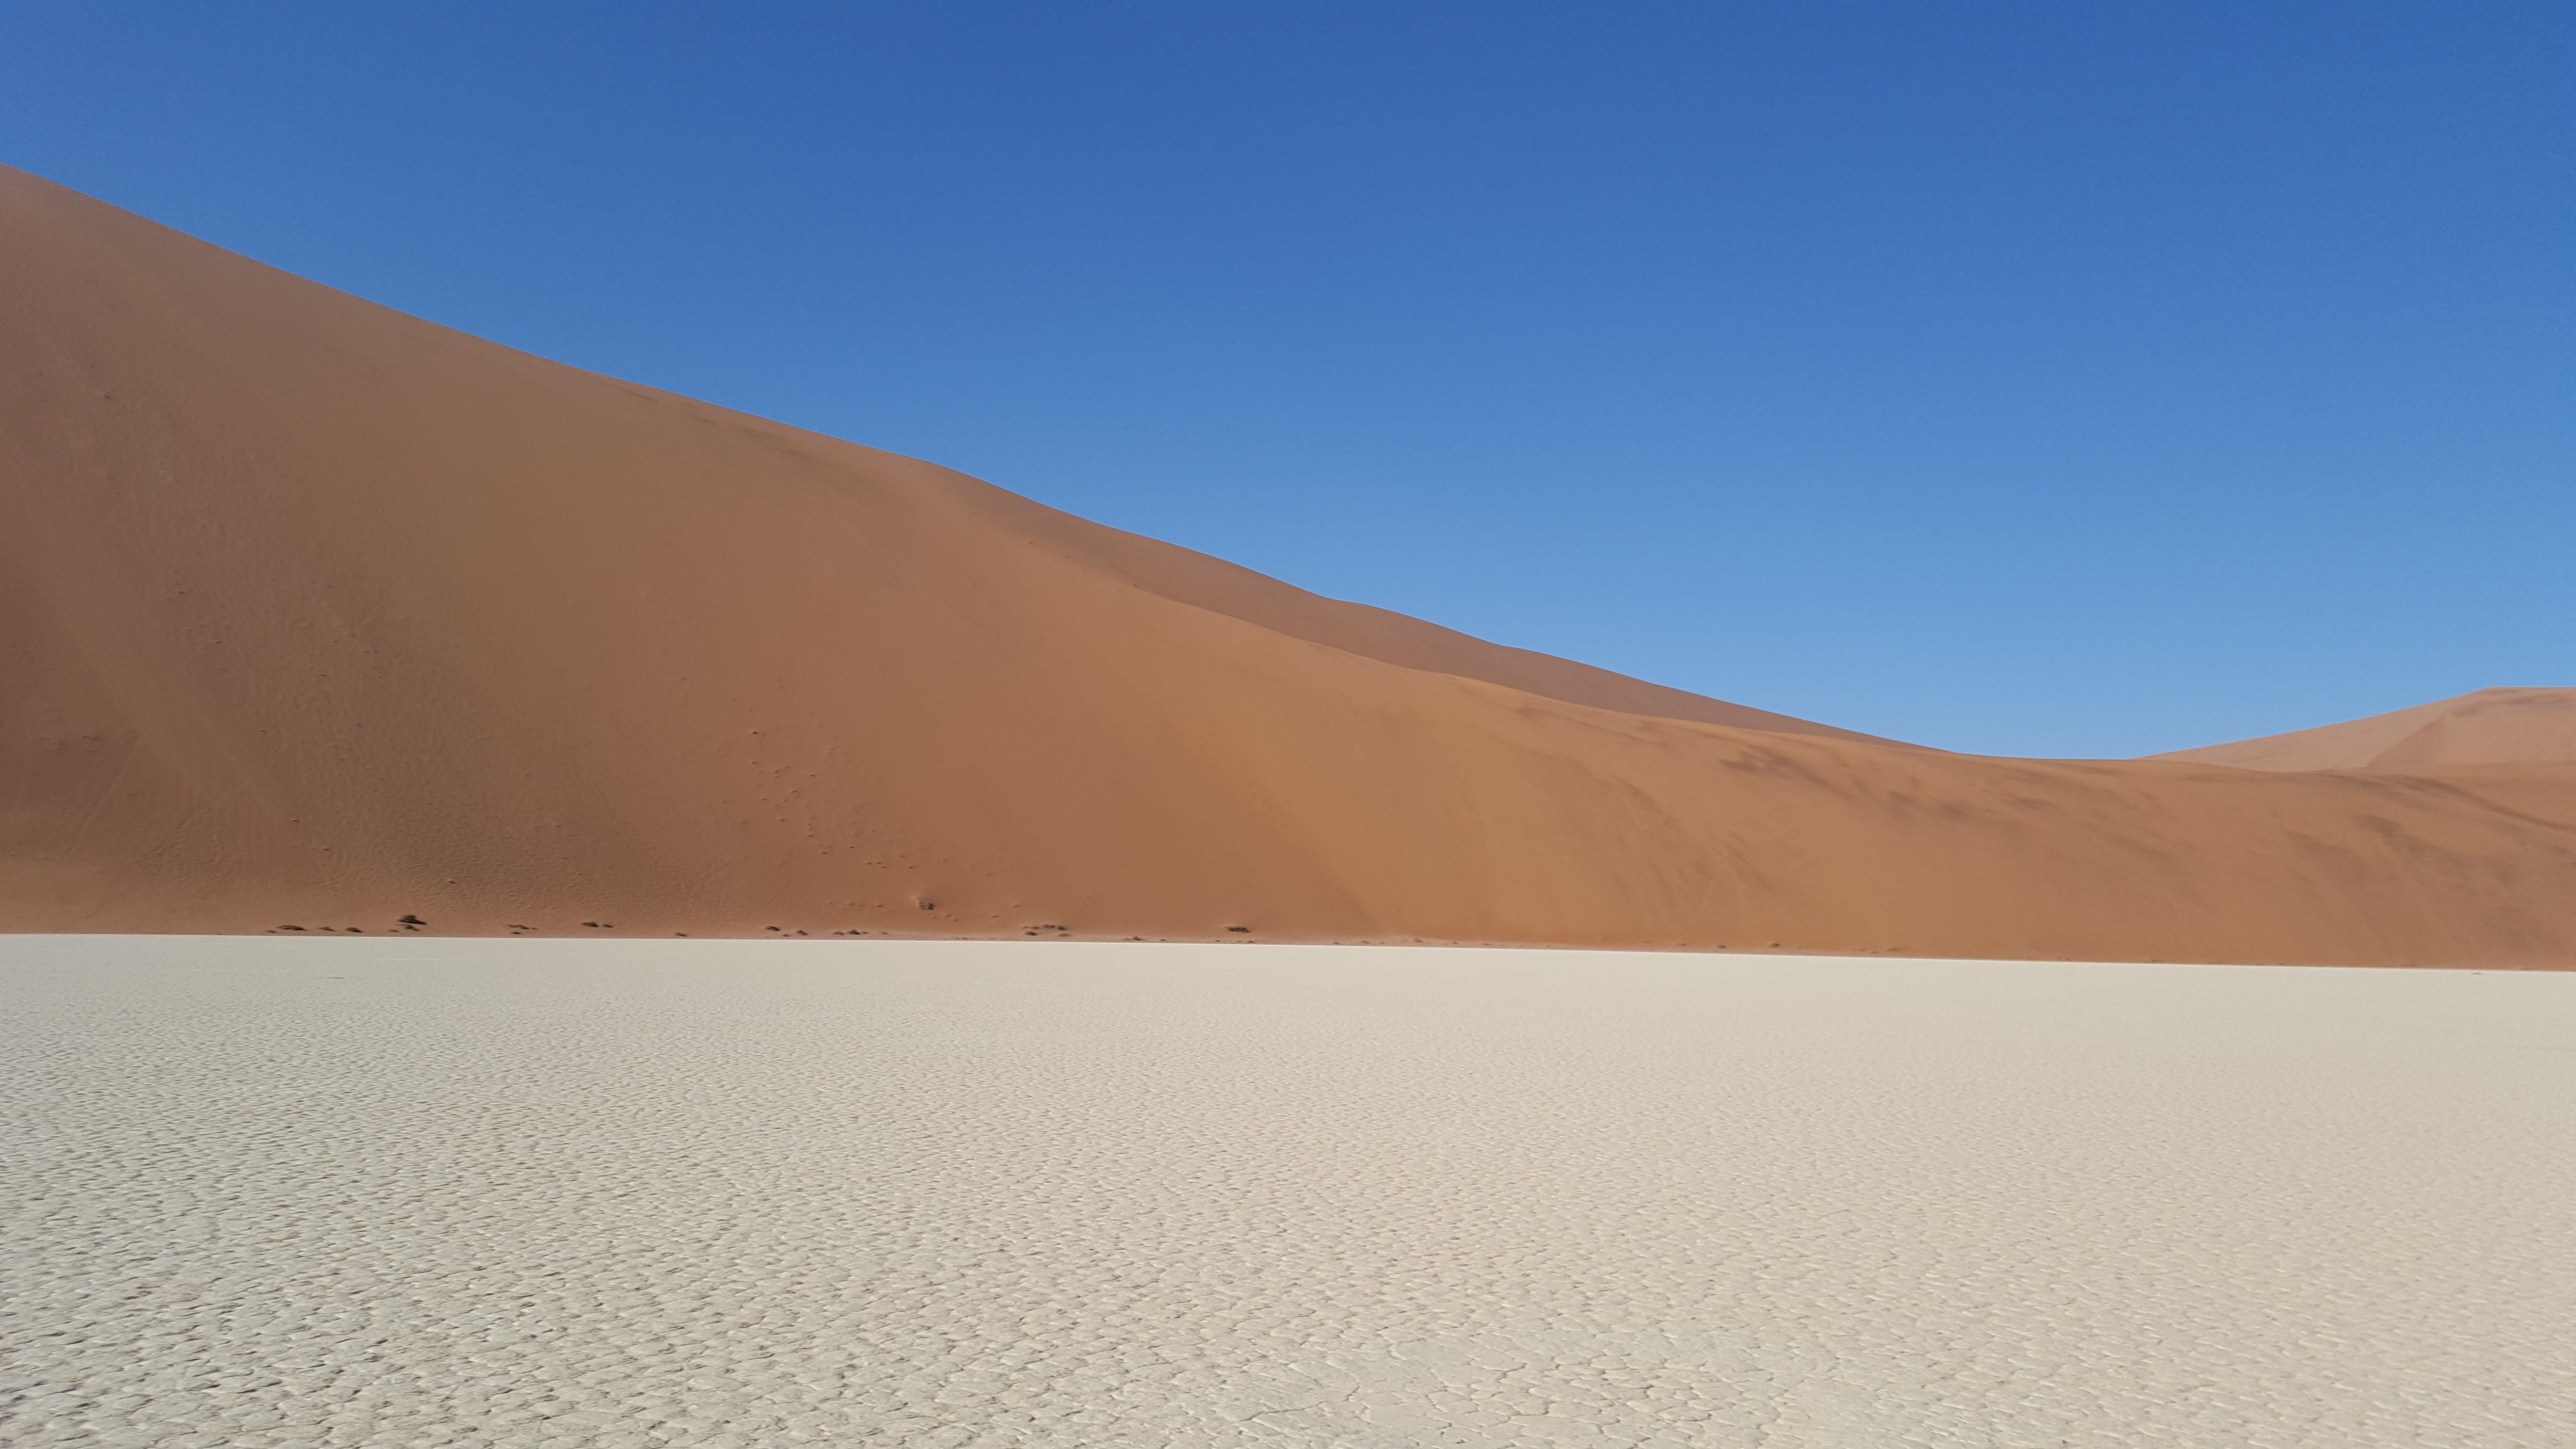 Free stock photo of desert, dune, enormous, landscape